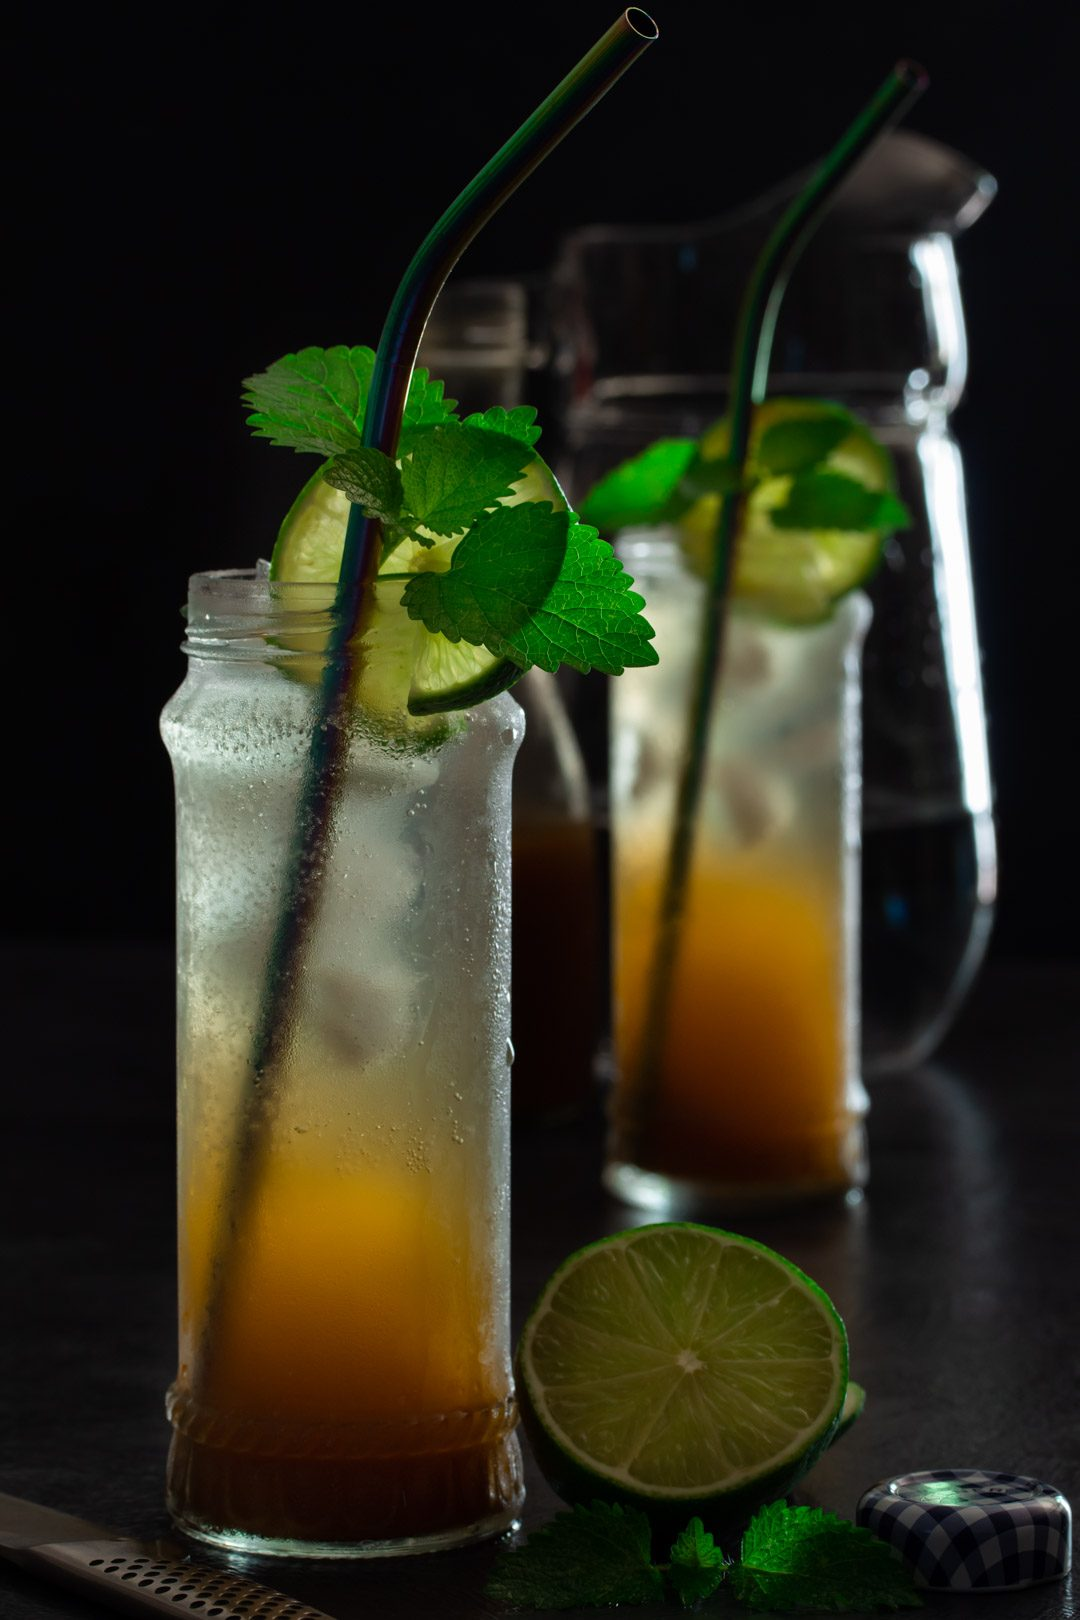 Ginger lime shrub syrup drinking vinegar: jug and bottle in background